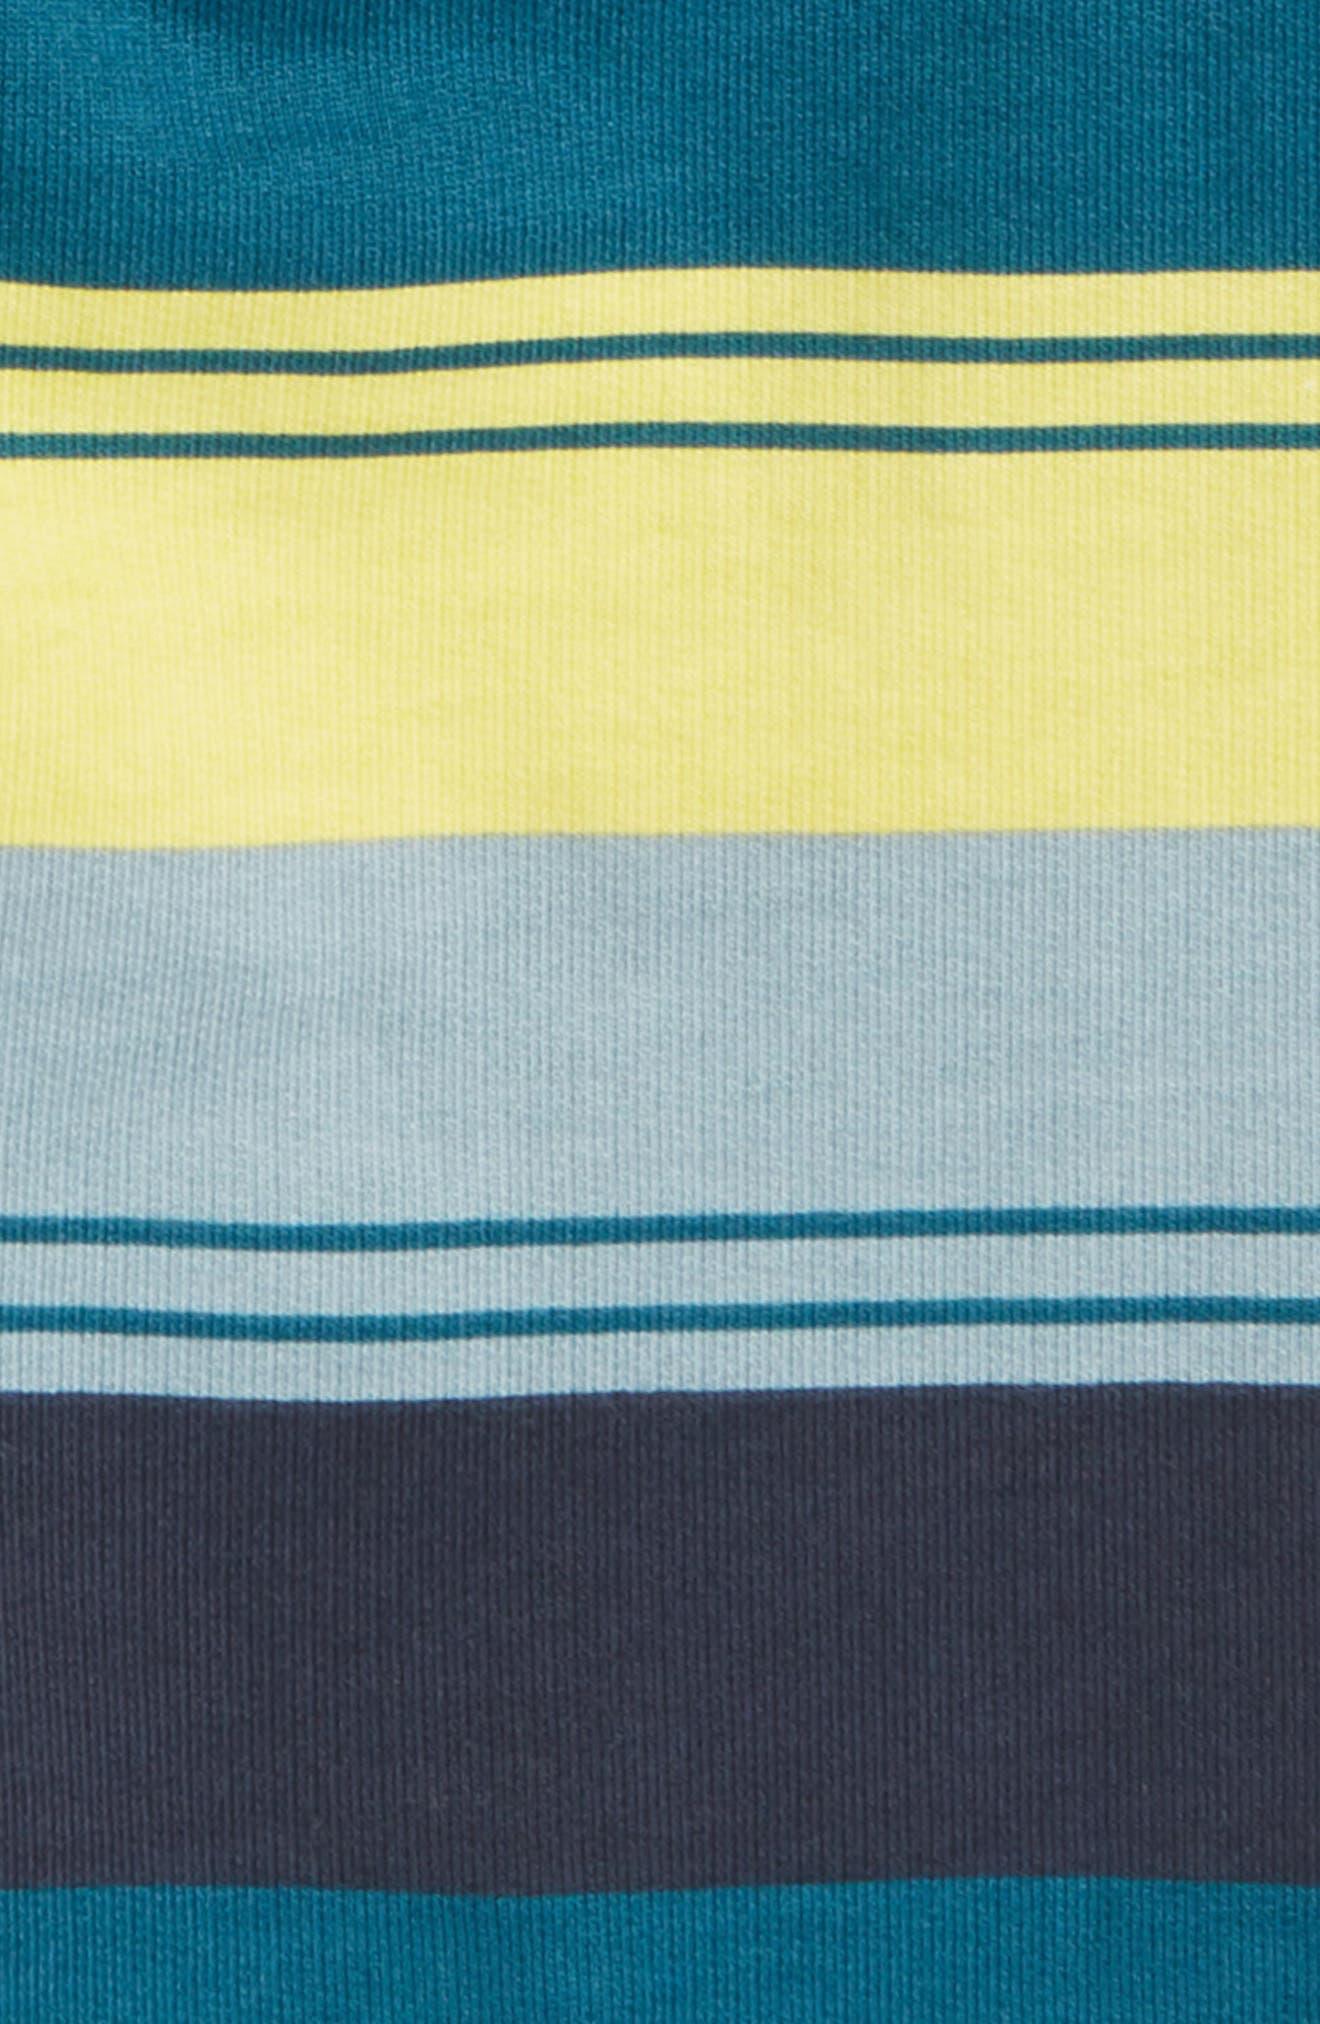 Cruiser Print Shorts,                             Alternate thumbnail 2, color,                             Indigo Tri-Stripe